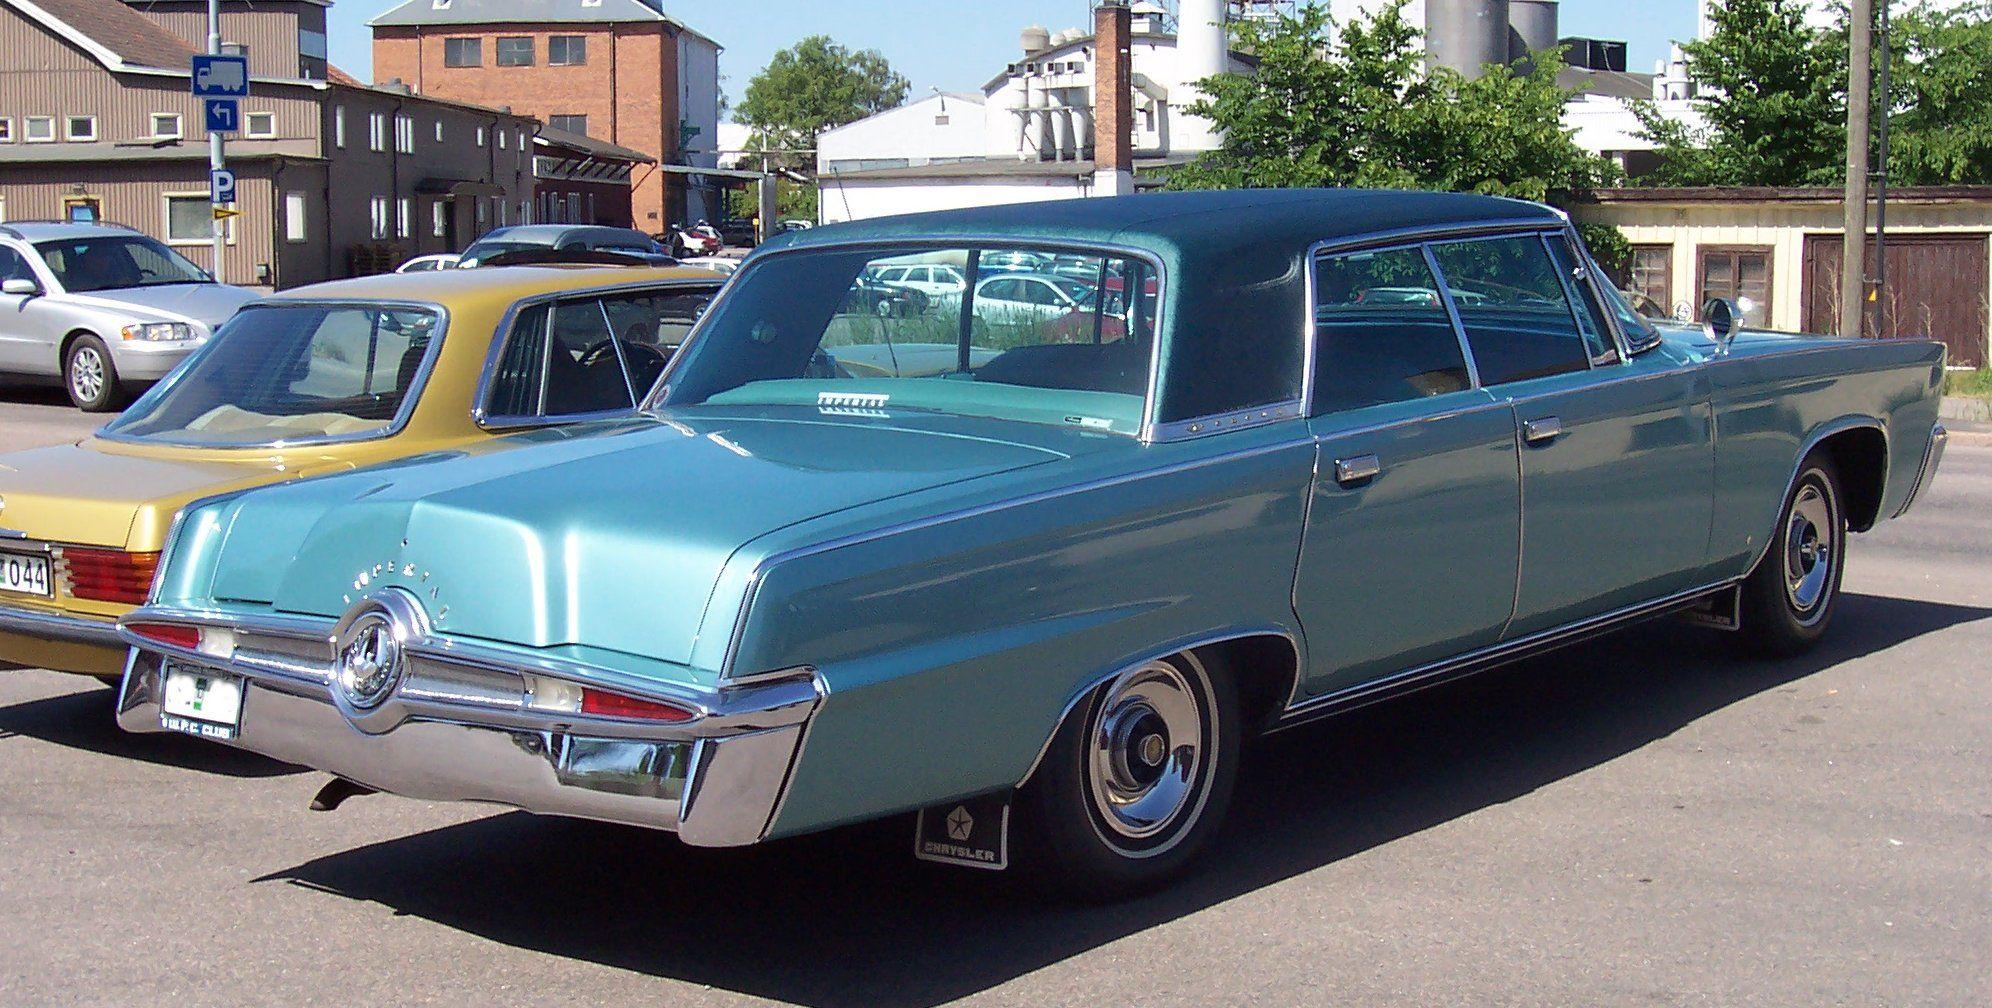 1965 Imperial Crown 4 Door Hardtop Chrysler Cars Chrysler